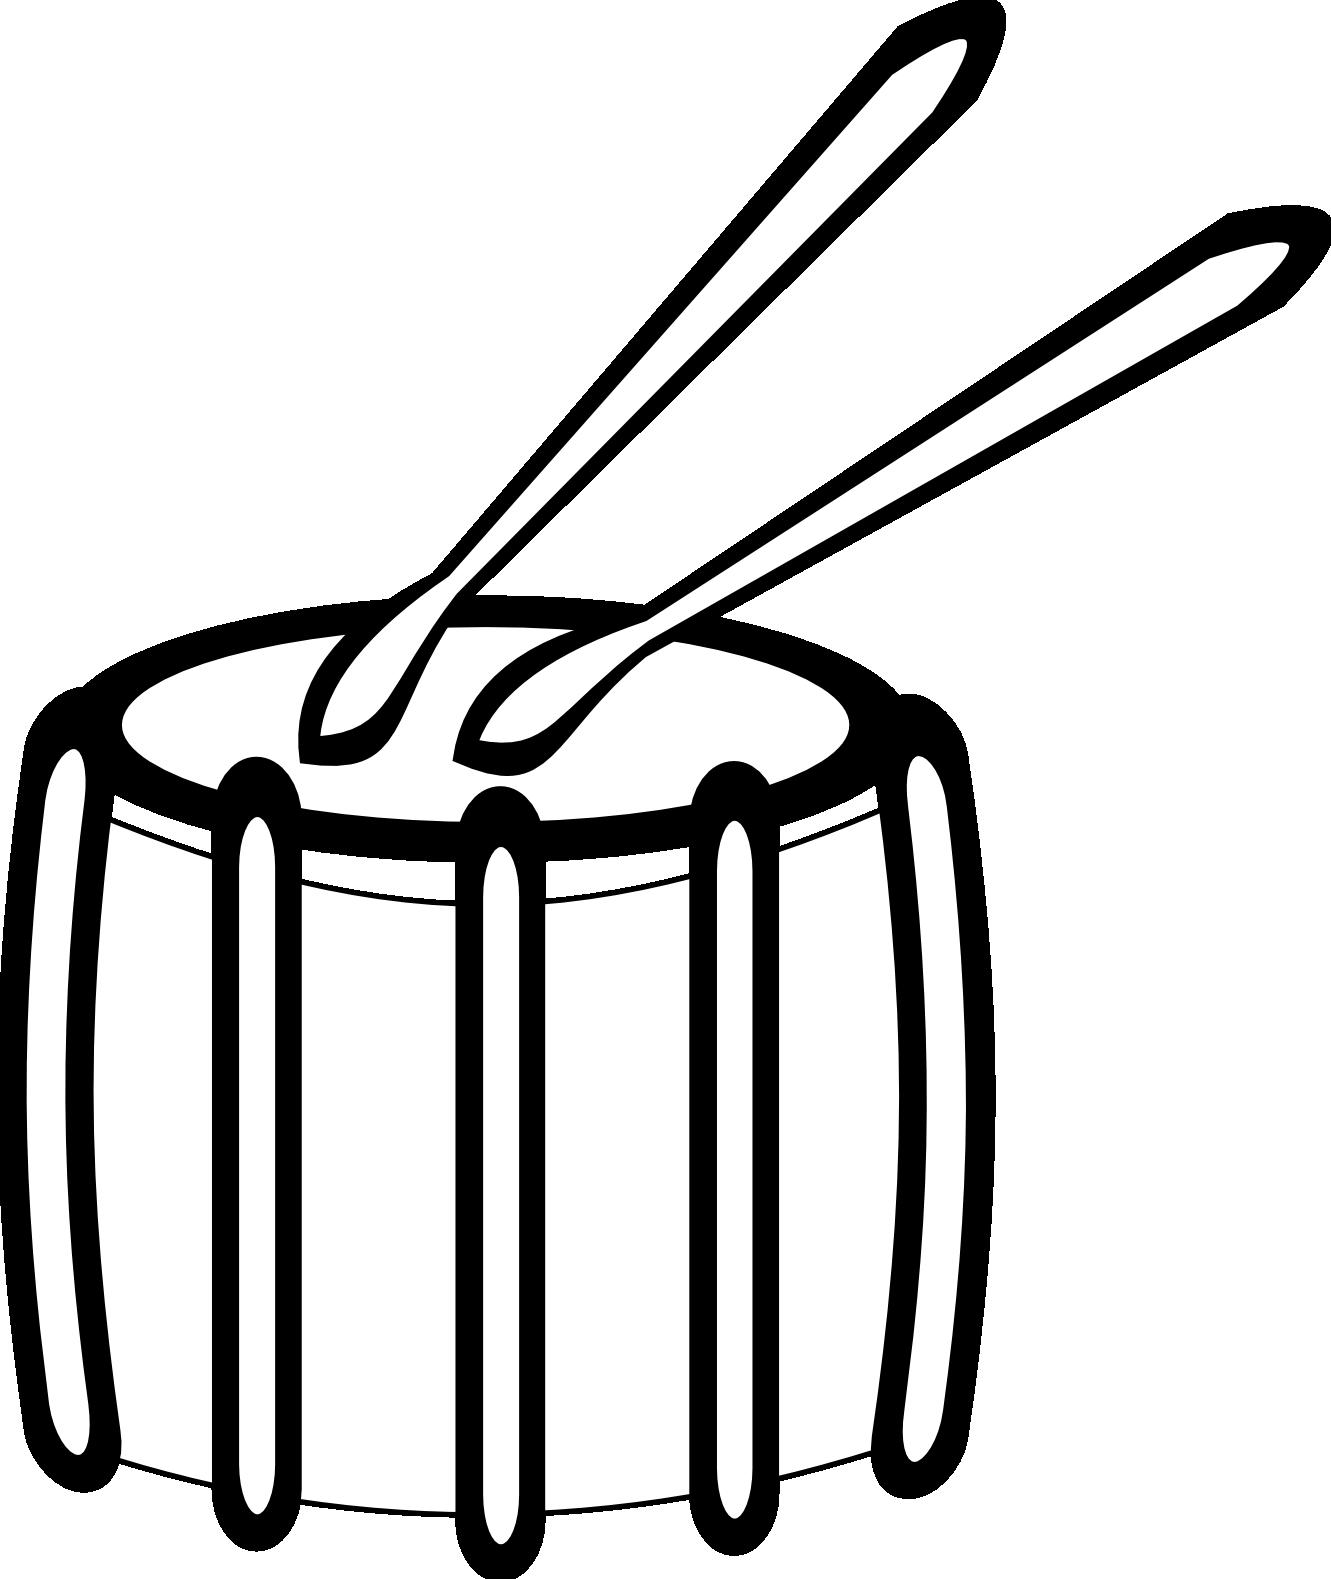 drums clipart drum sound